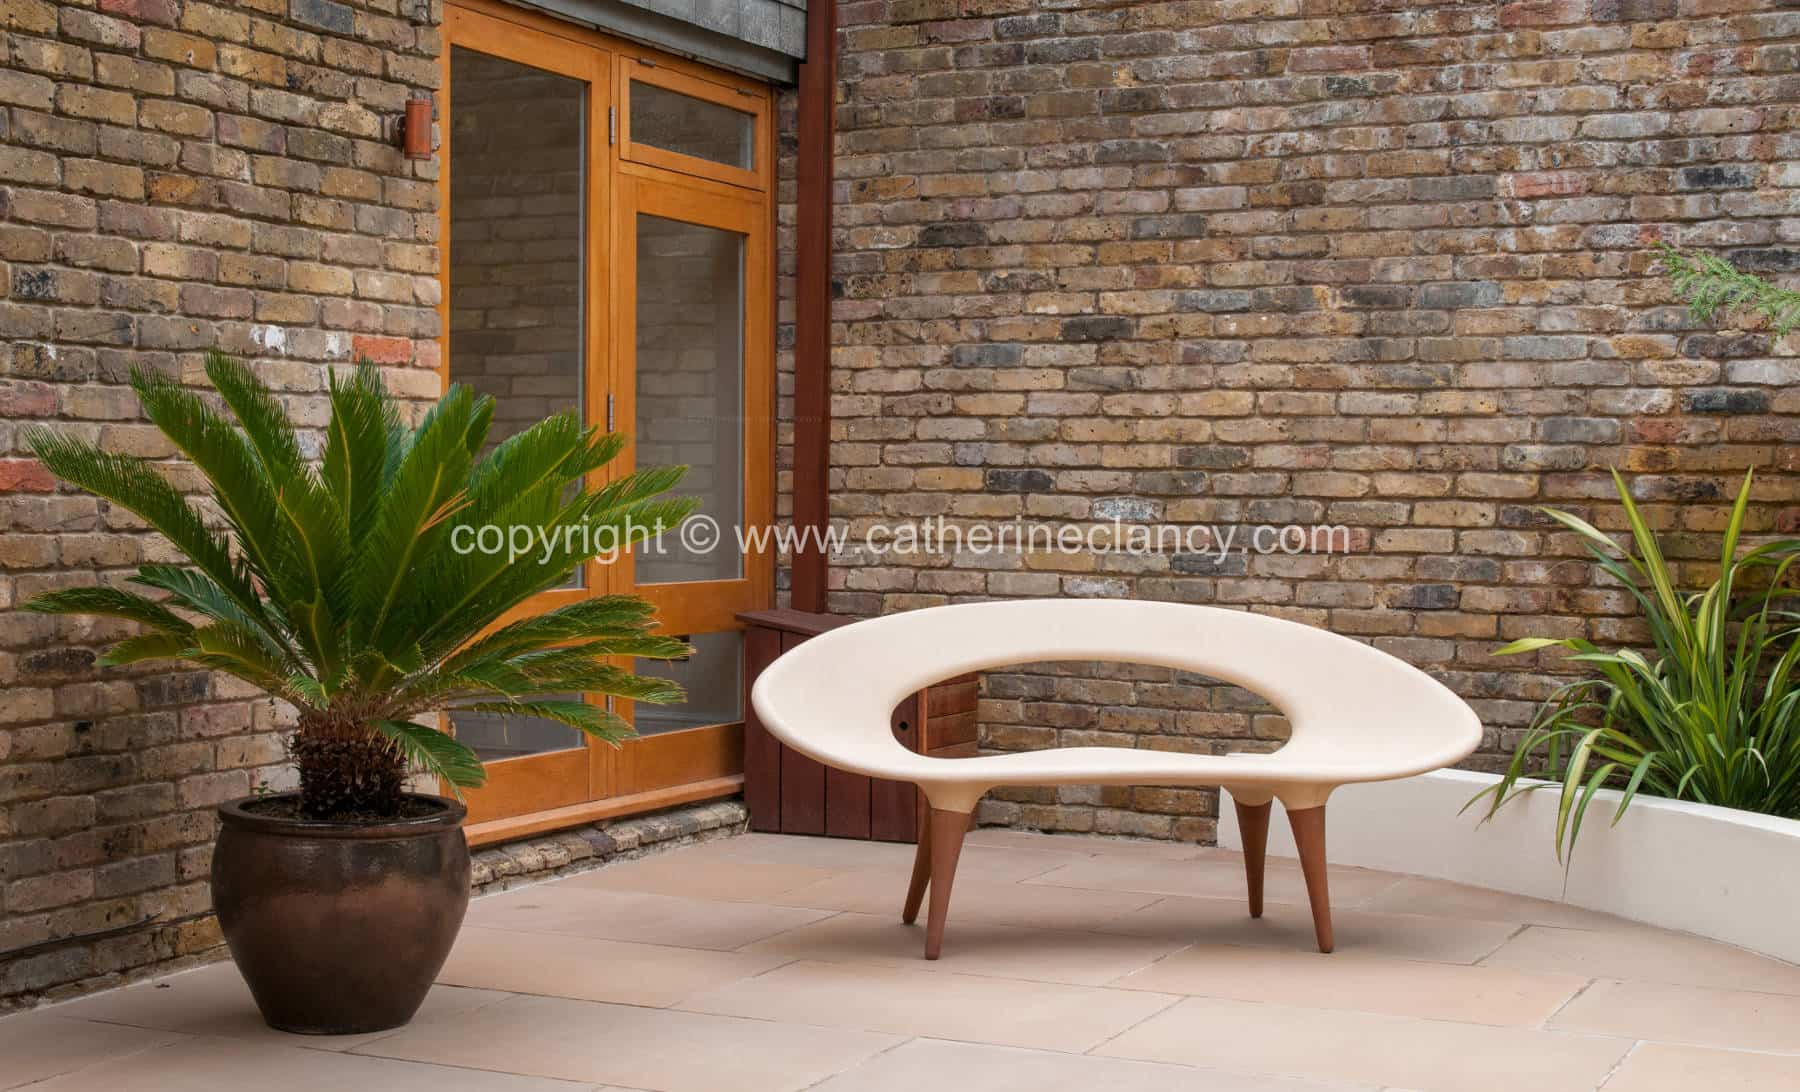 blackheath-courtyard-10